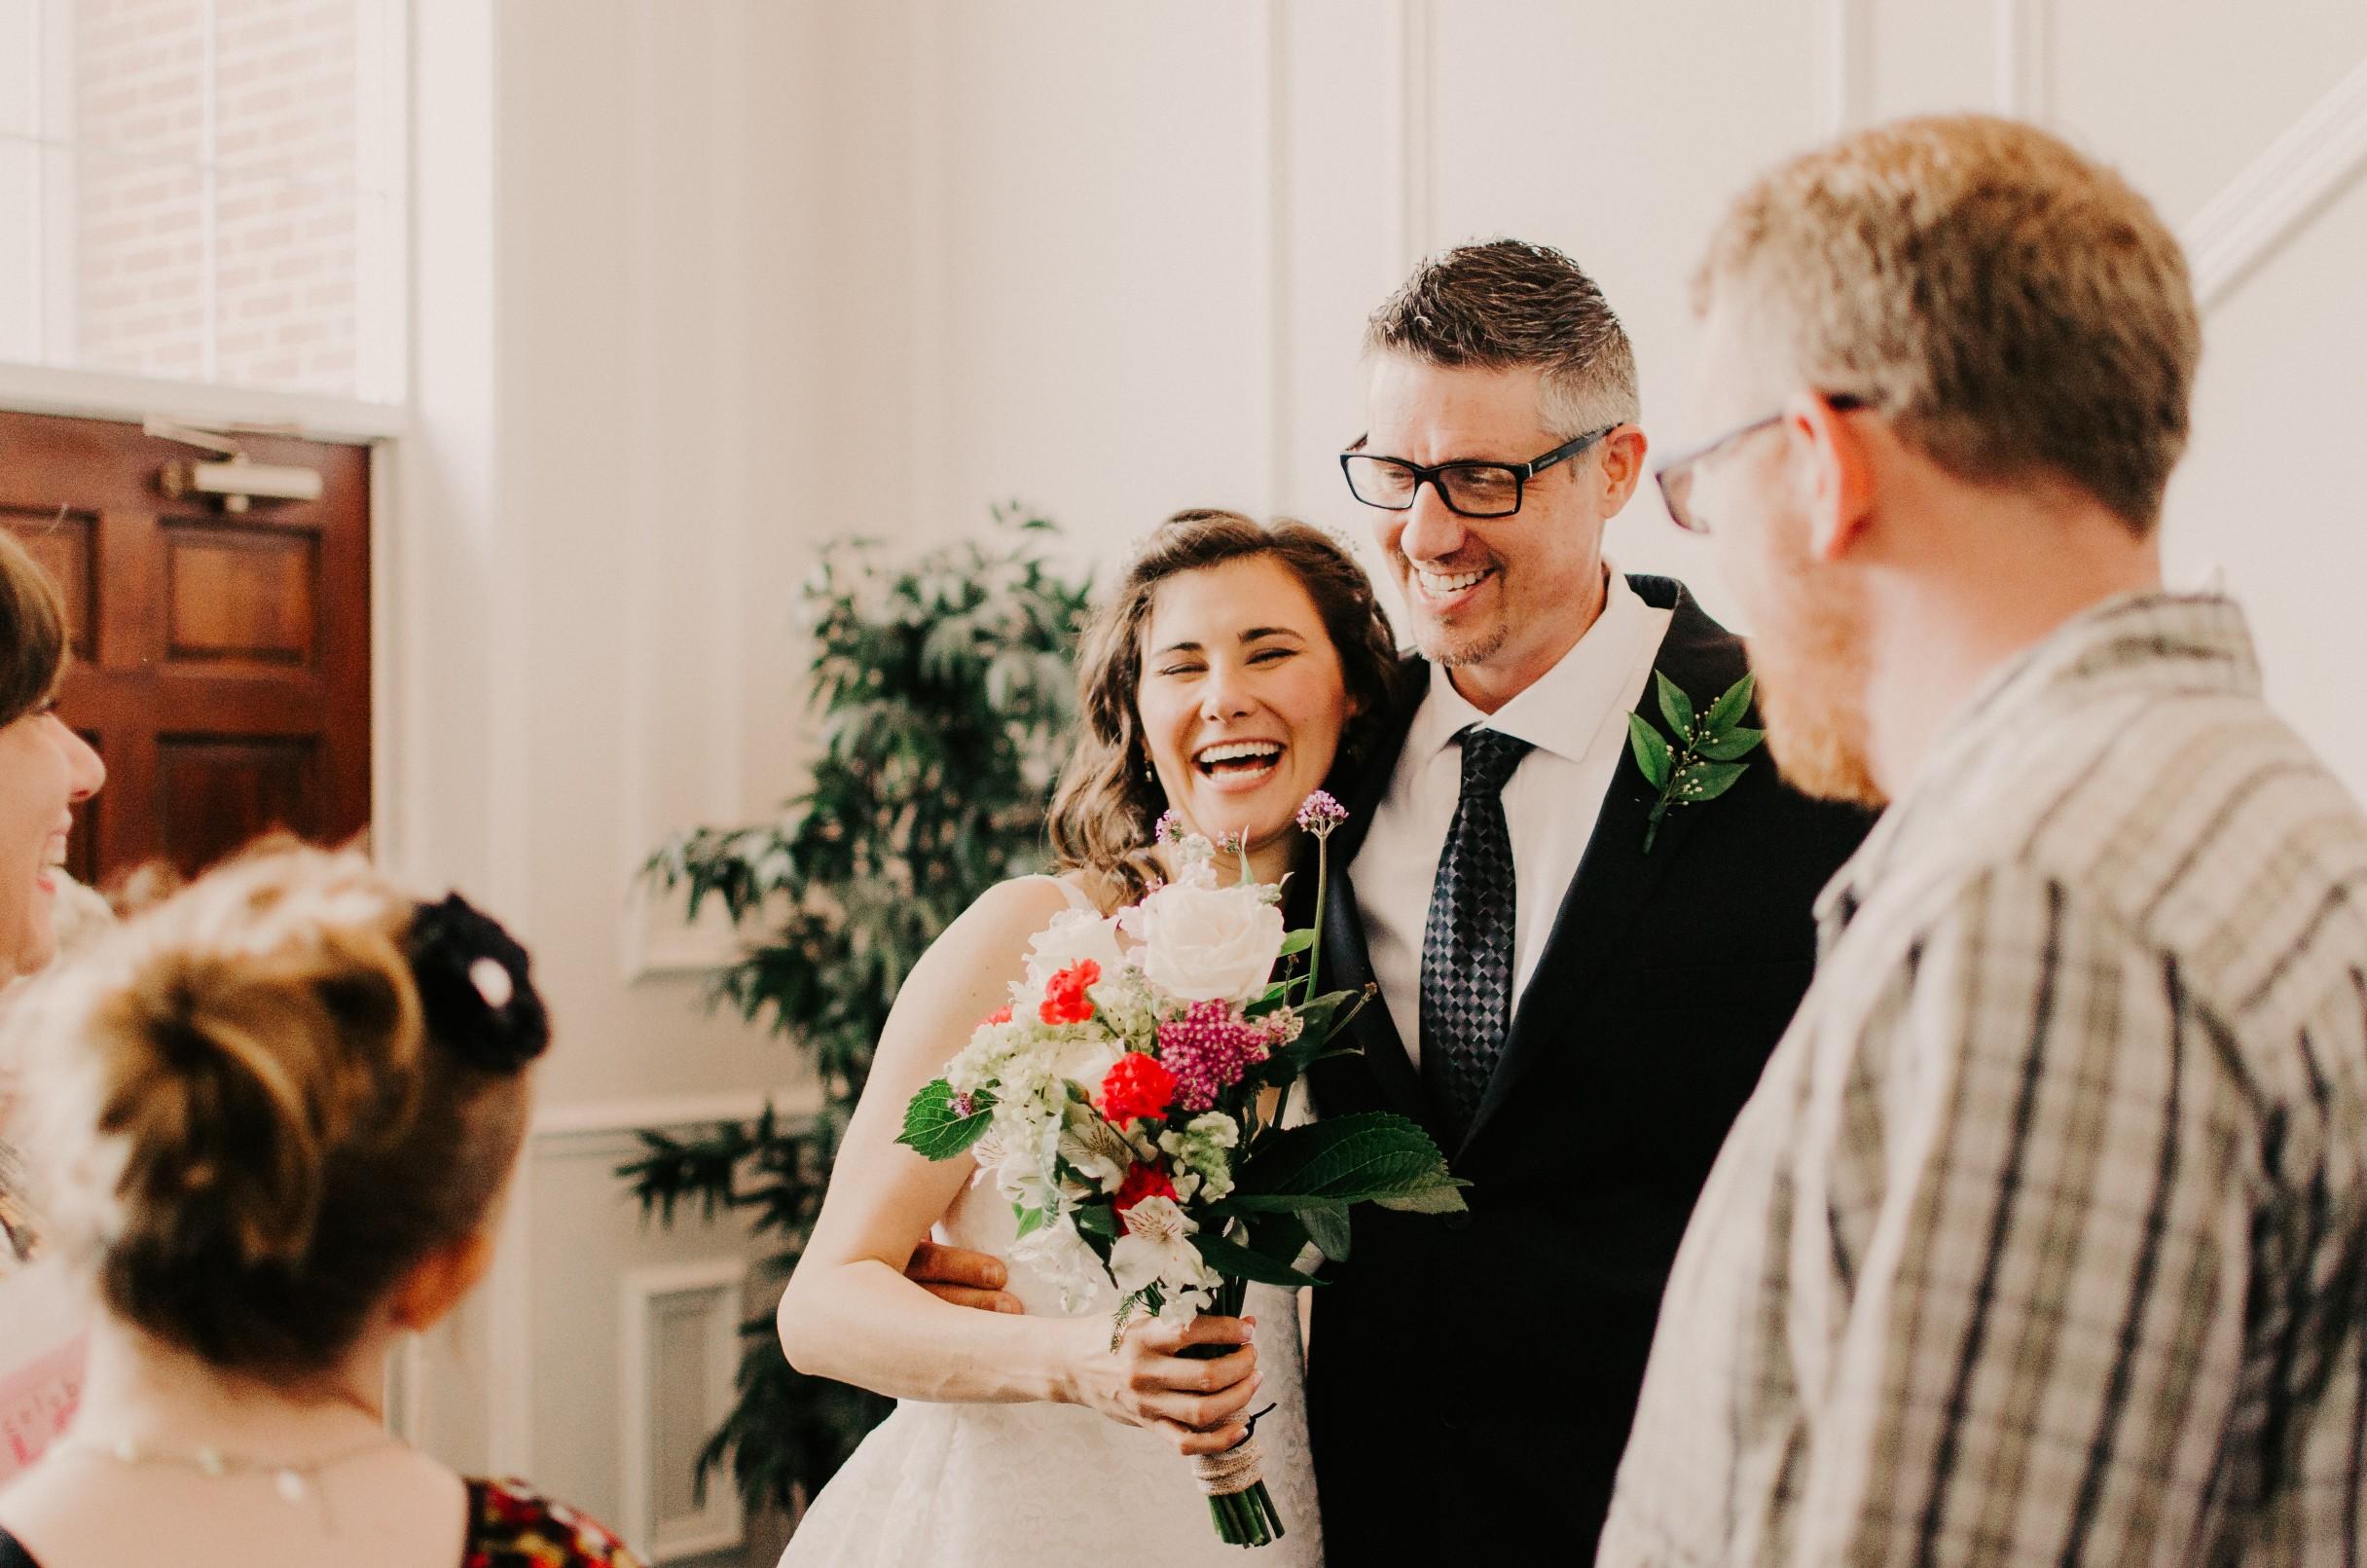 wedding-photography-wooton.jpg.